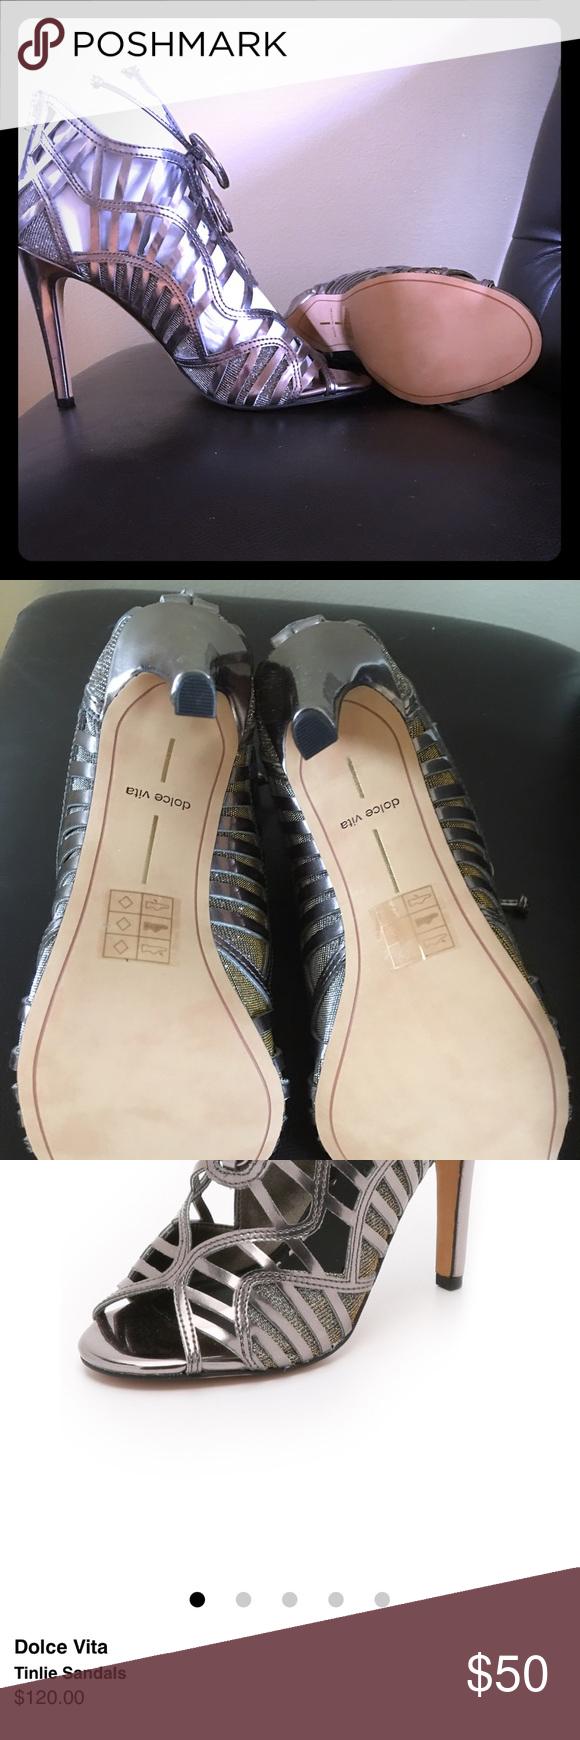 Dolce Vita Sandals Brand New with Box M=medium width Open